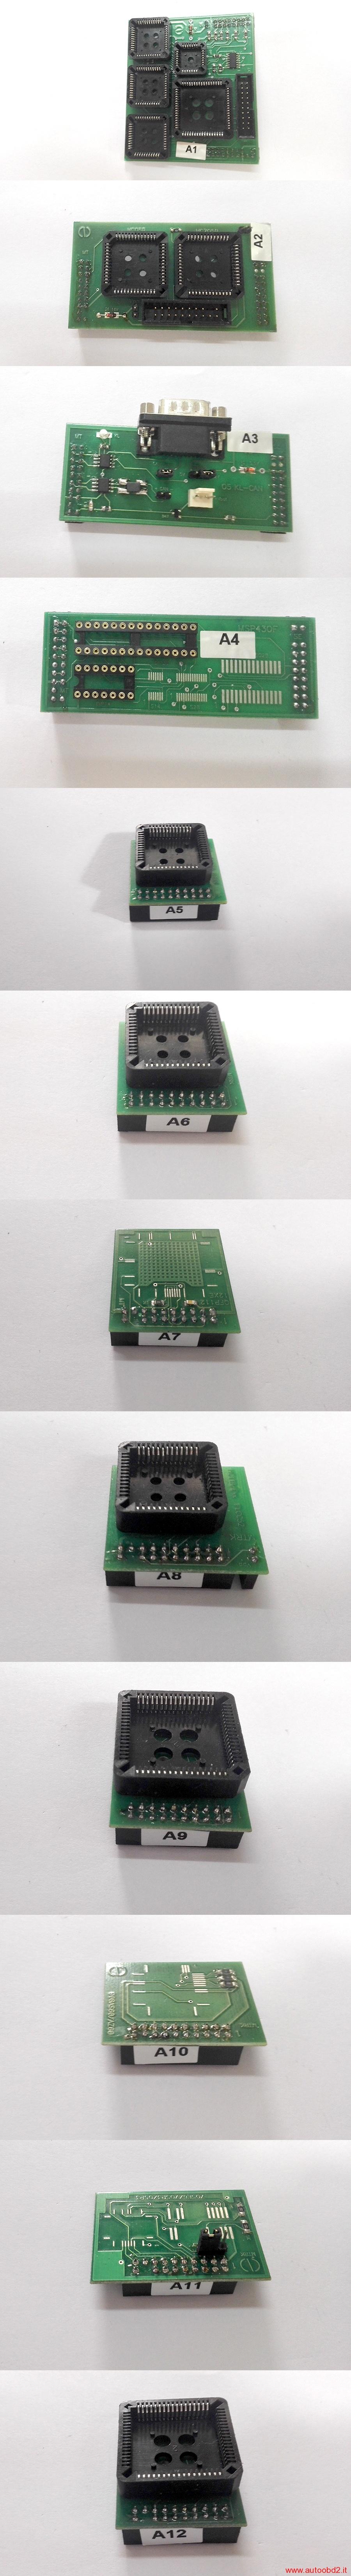 orange-5-adapters-01